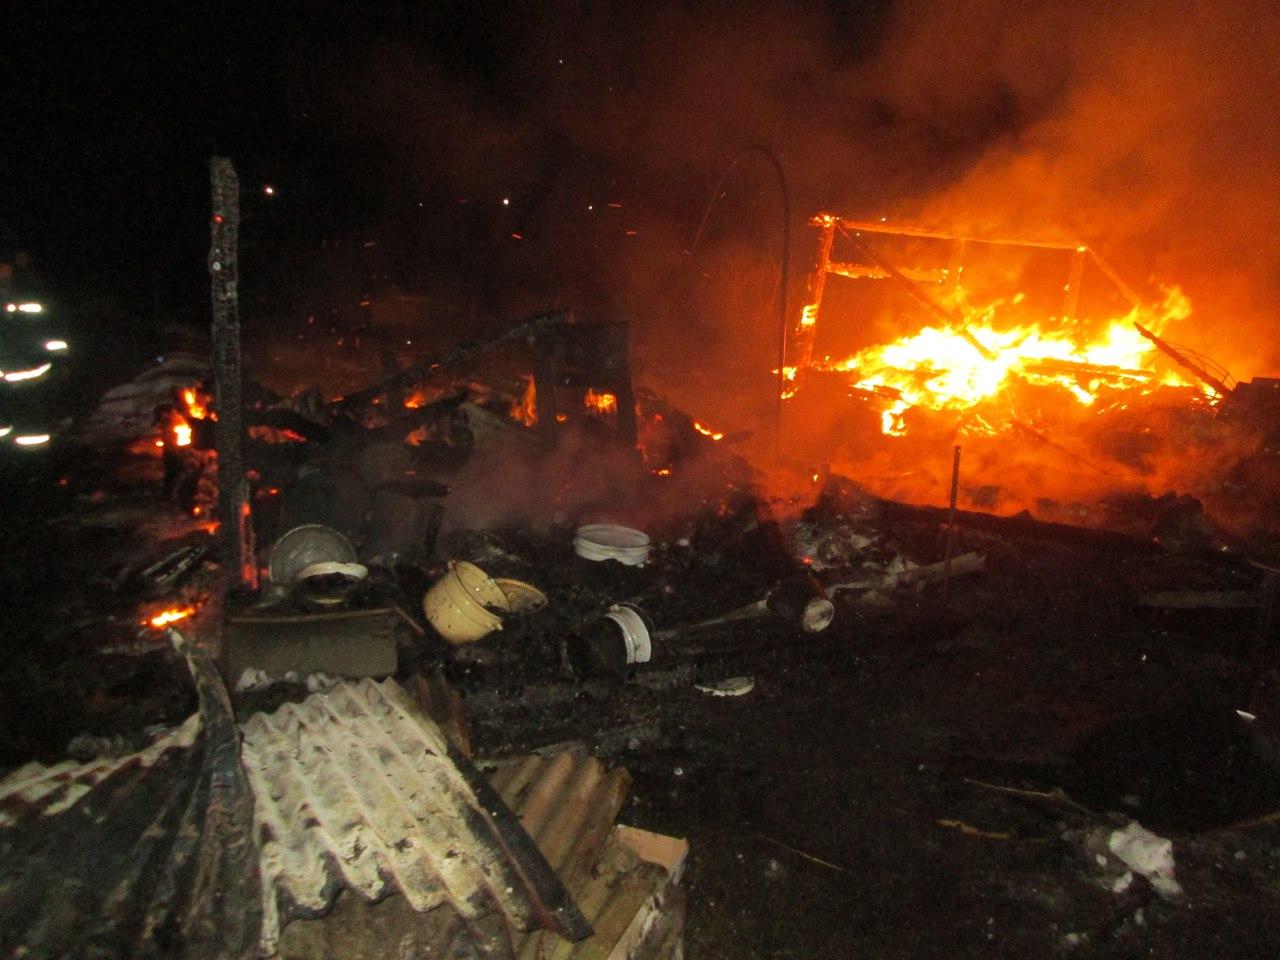 На даче в Череповецком районе загорелся обогреватель: хозяйка погибла на пожаре